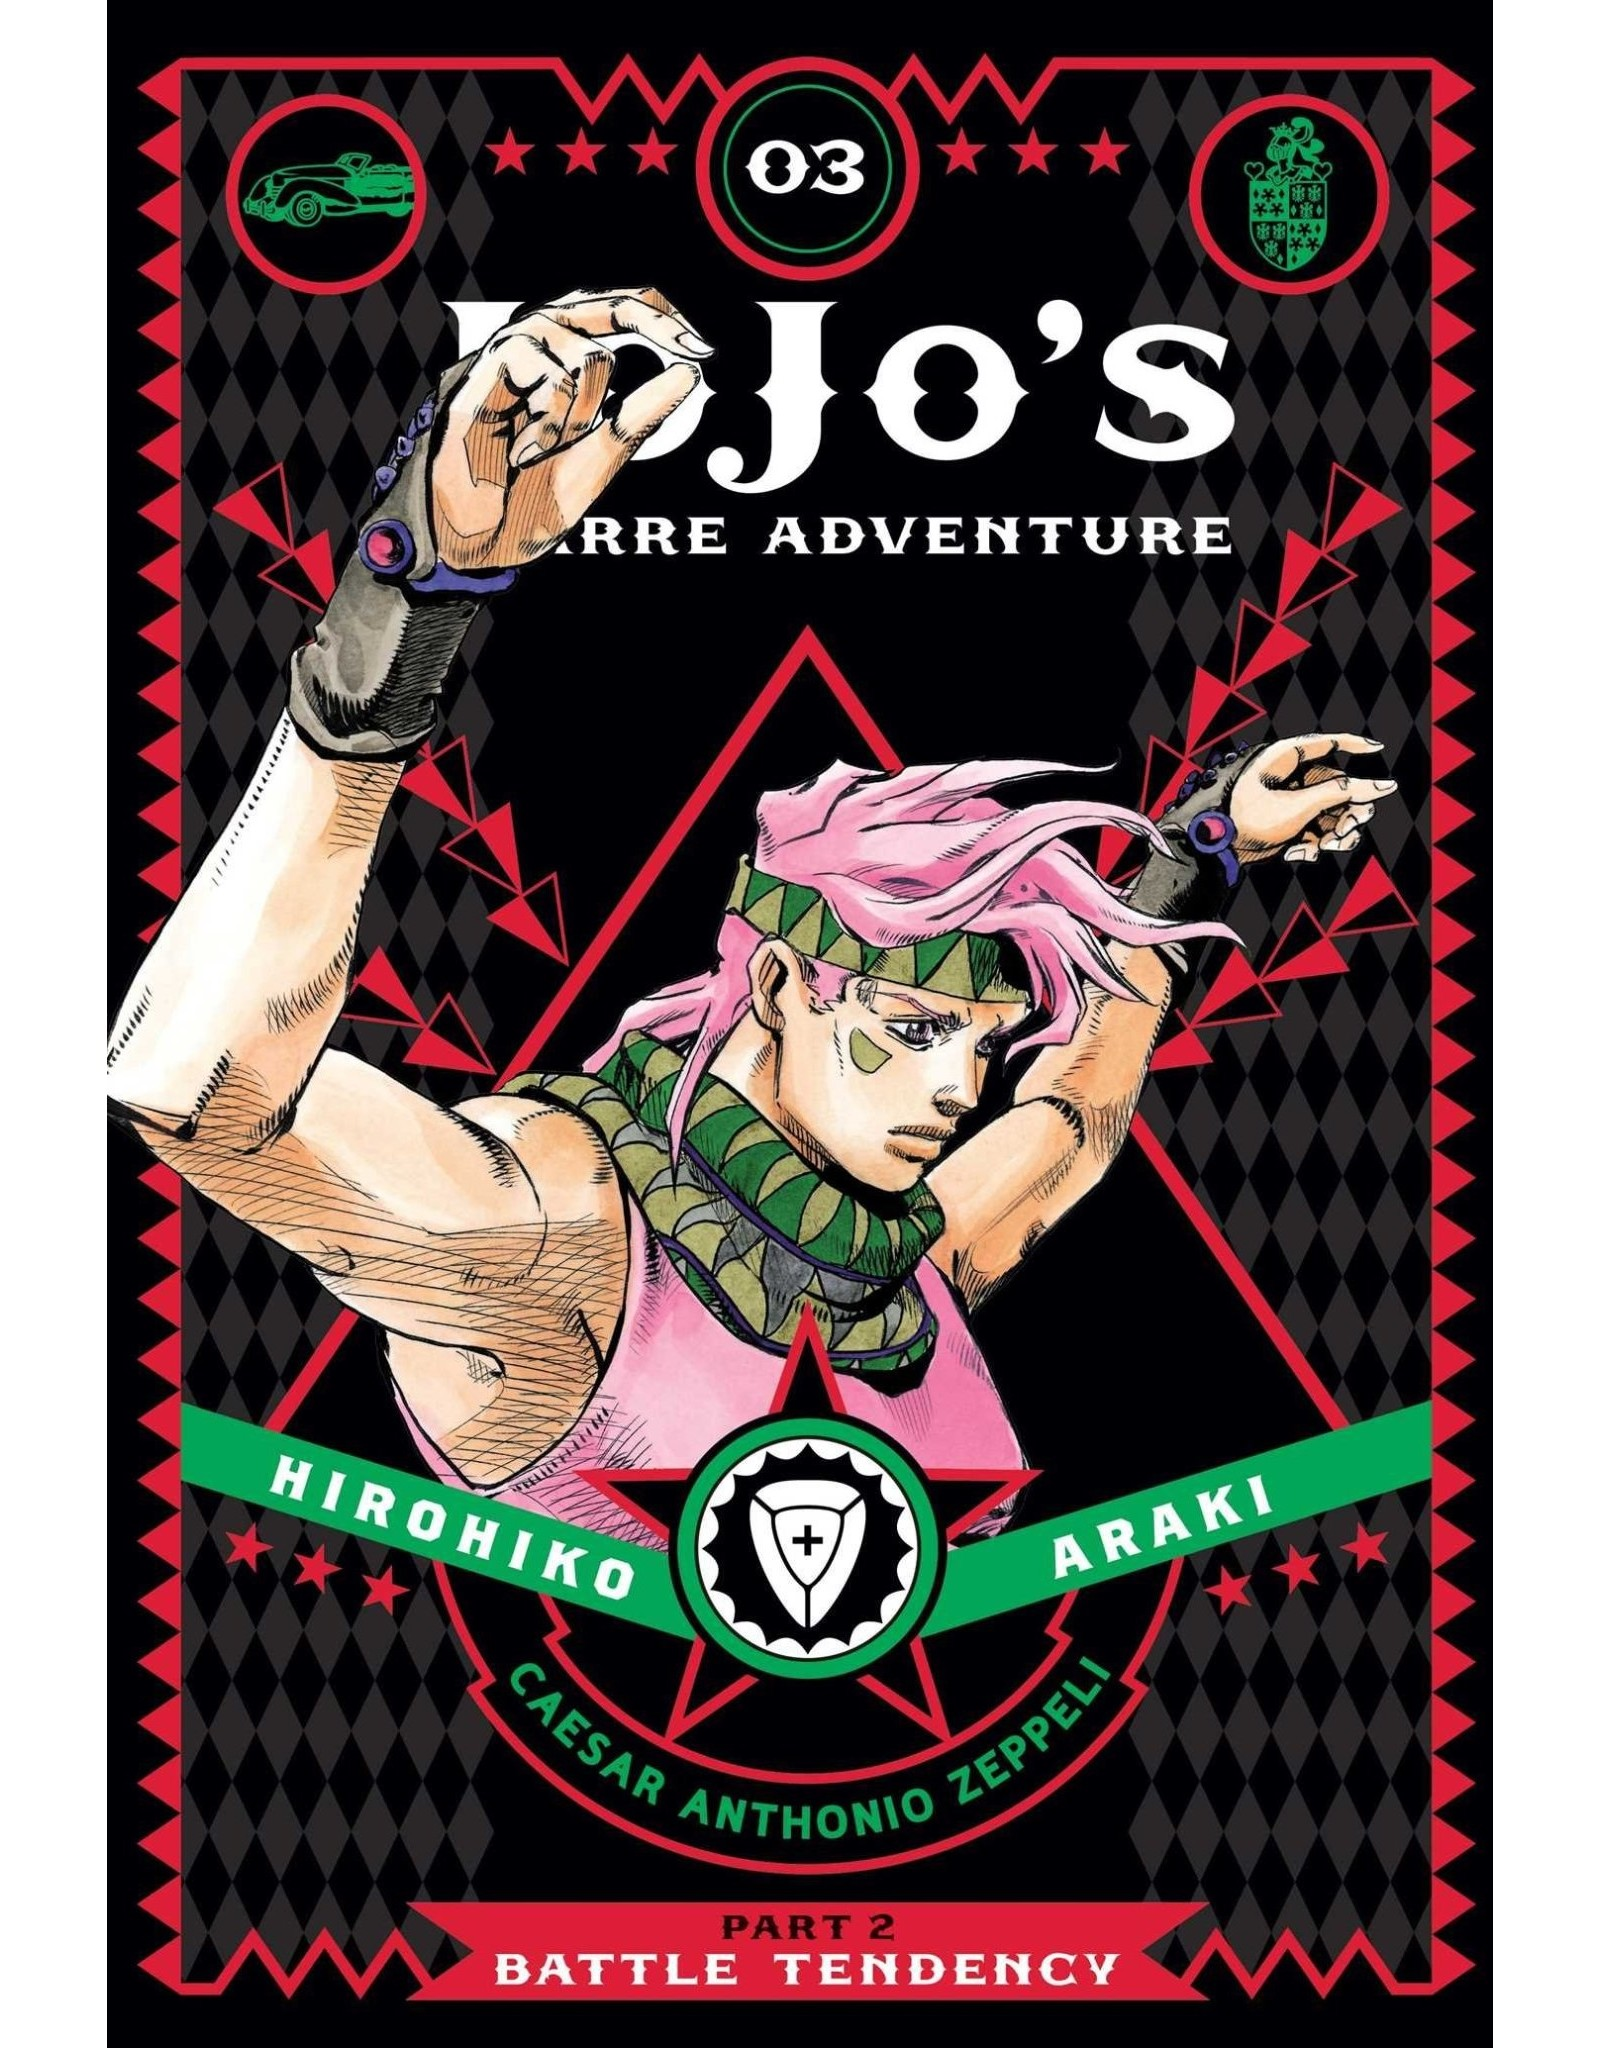 Jojo's Bizarre Adventure - Part 2: Battle Tendency - Volume 3 - Hardcover (English Version)